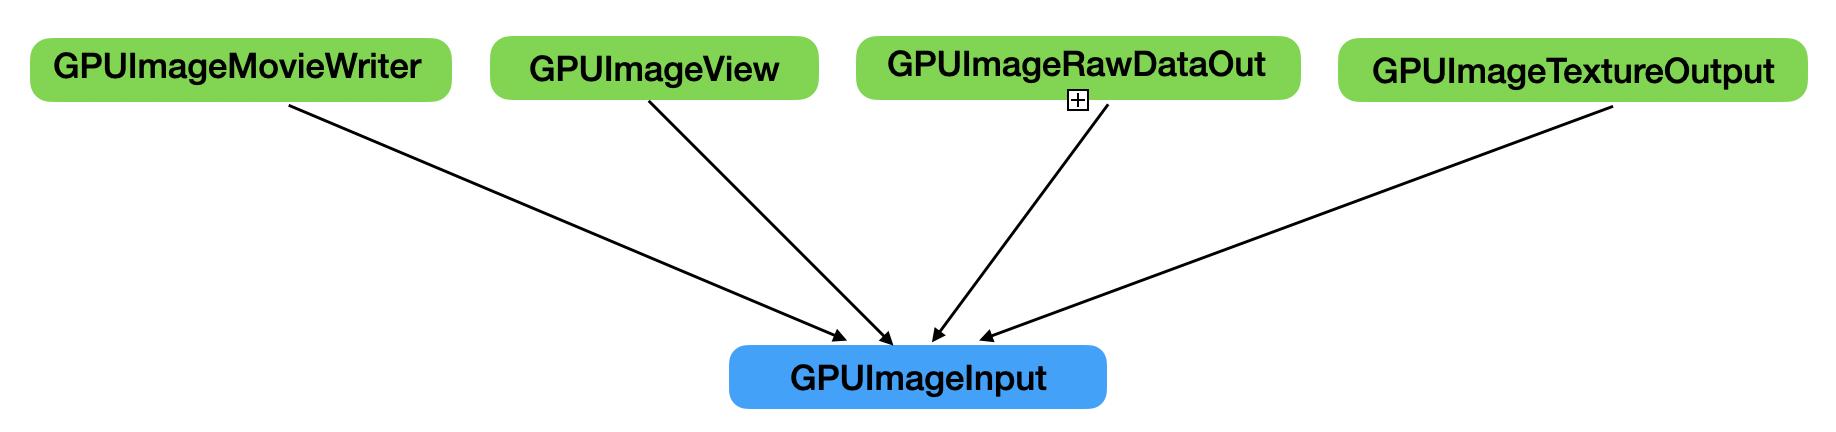 GPUImageInput协议